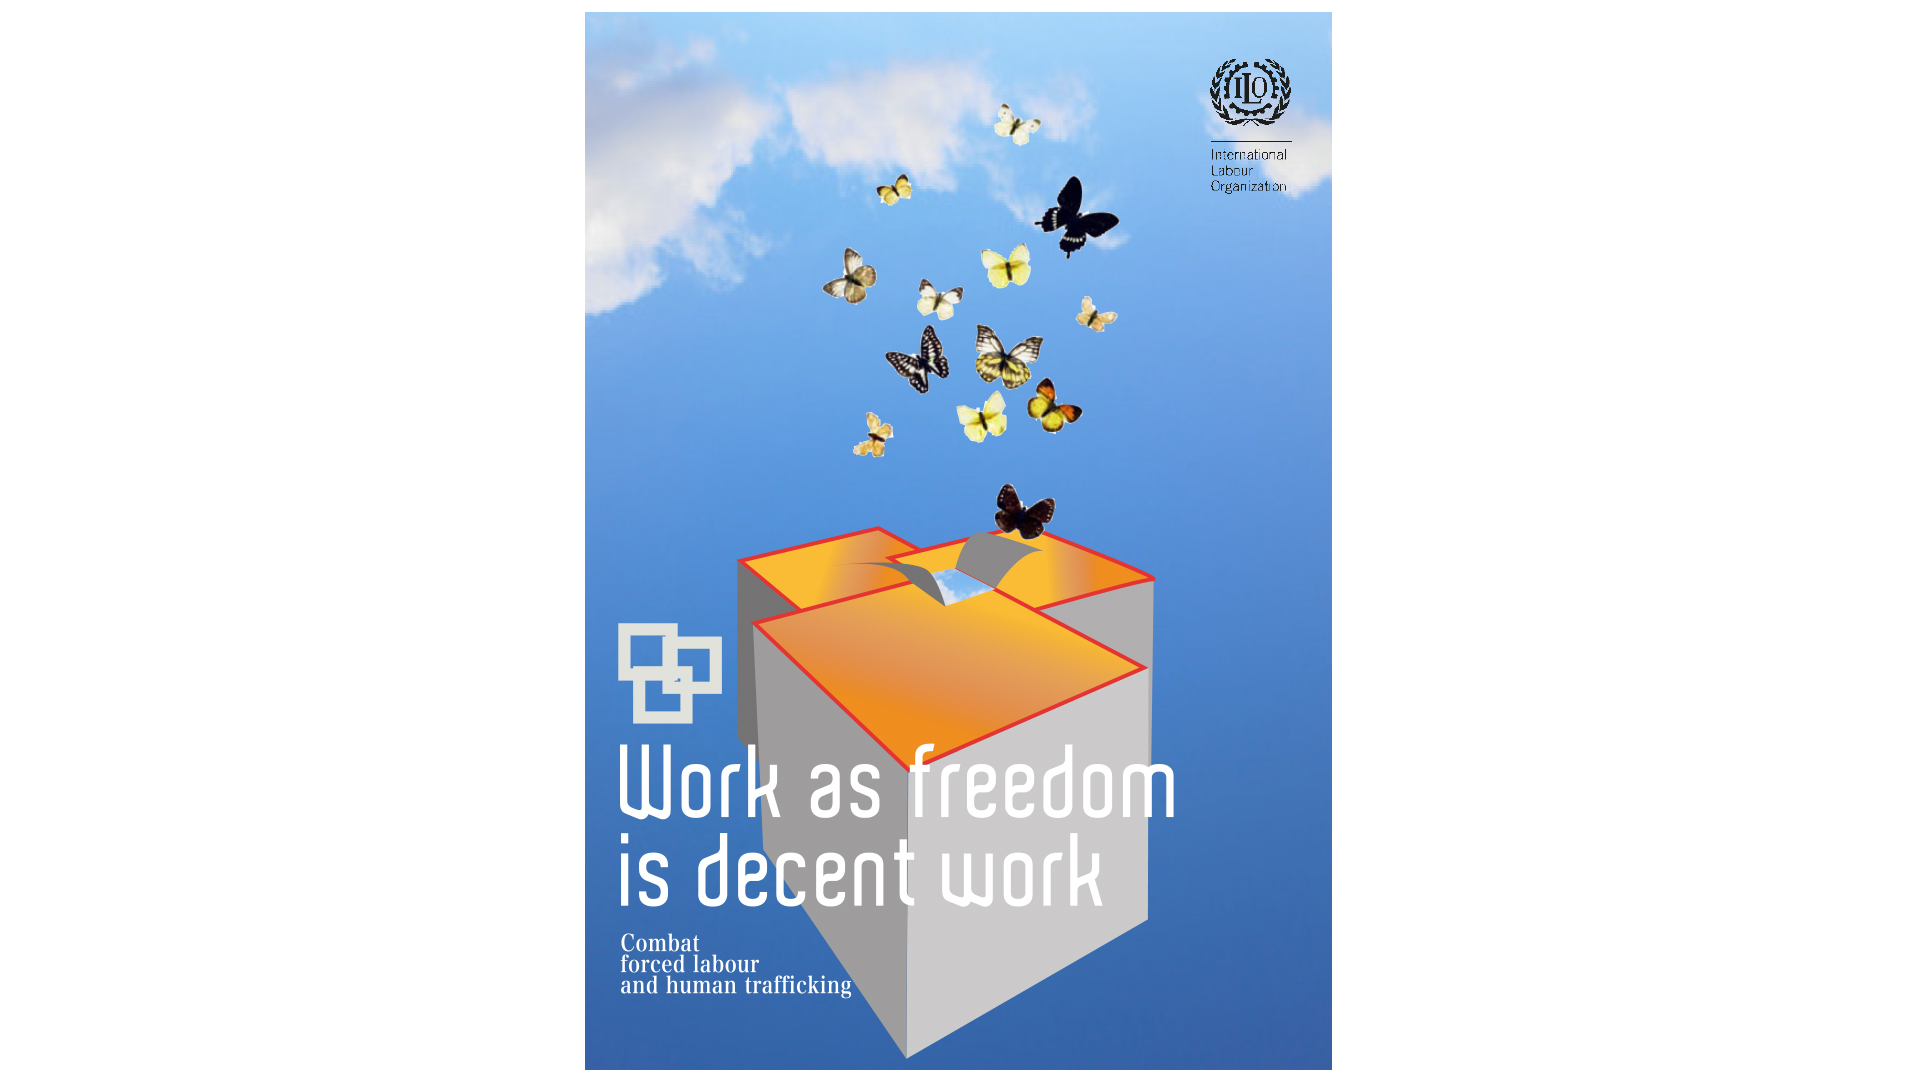 ILO-Work as freedom-affiche